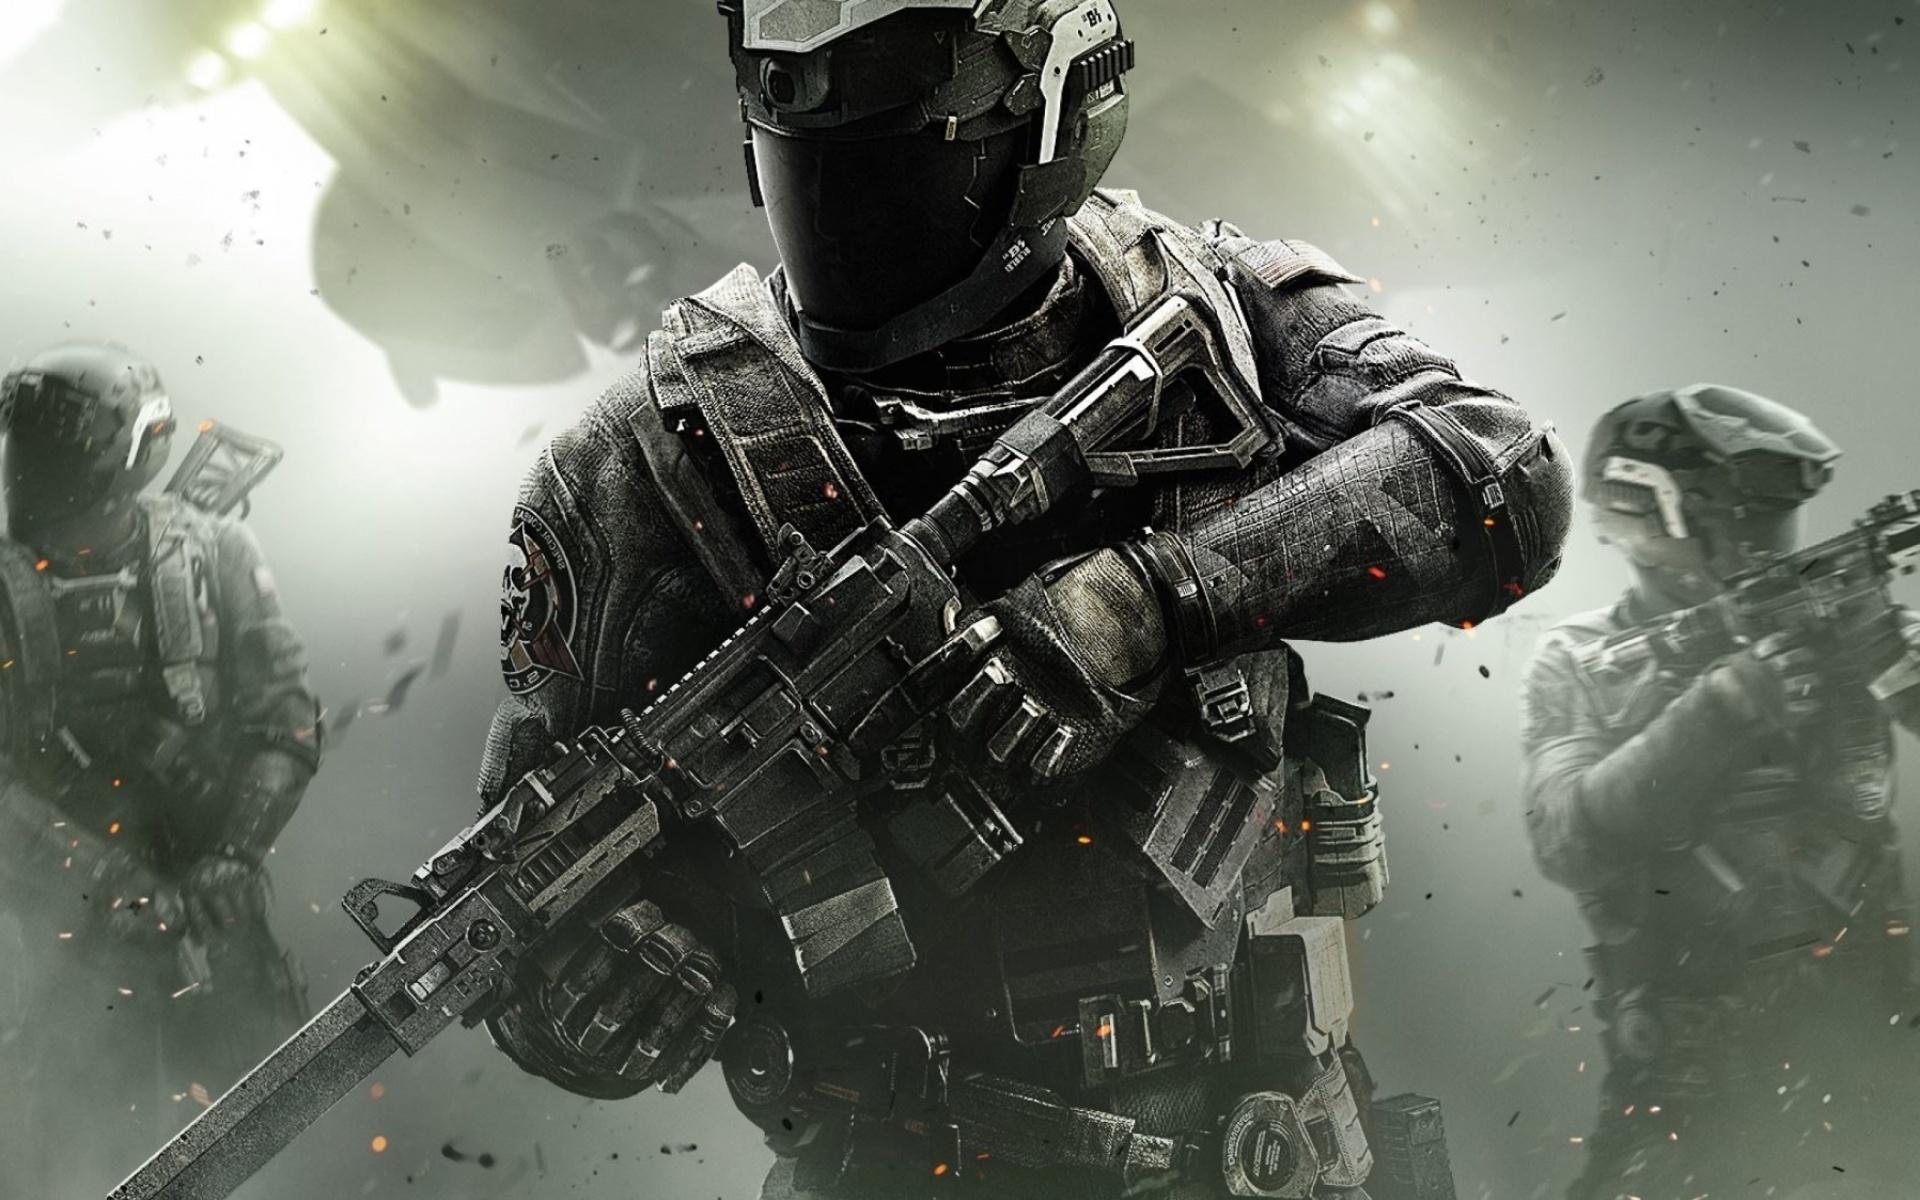 Cod Infinite Warfare Wallpaper: Call Of Duty Infinite Warfare 2 Wallpaper For Widescreen